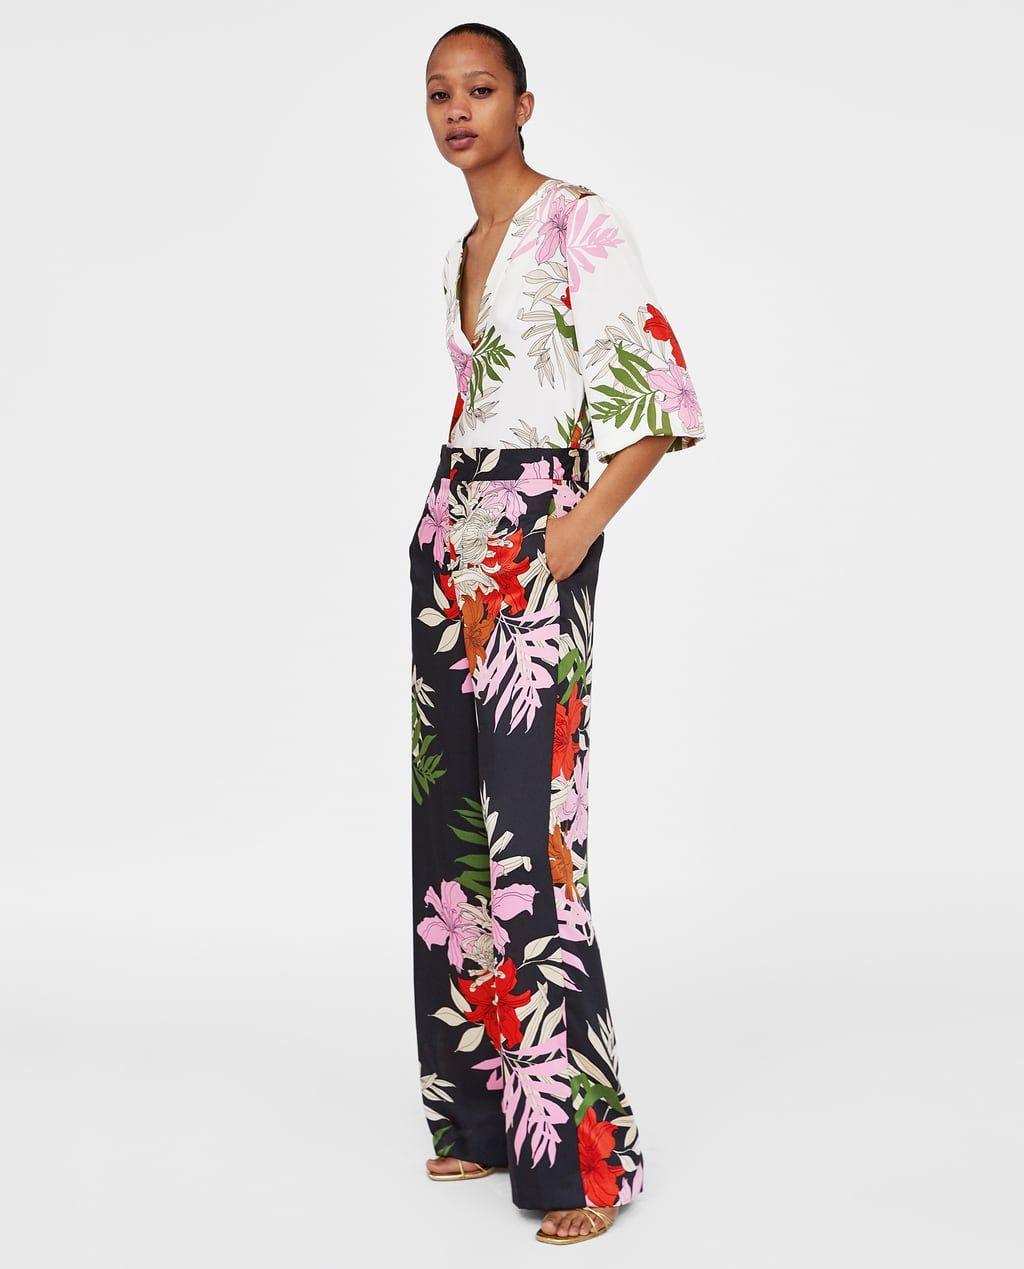 Zara Mujer Pantalon Ancho Estampado Floral Modestil Blumenmode Frauen Outfits